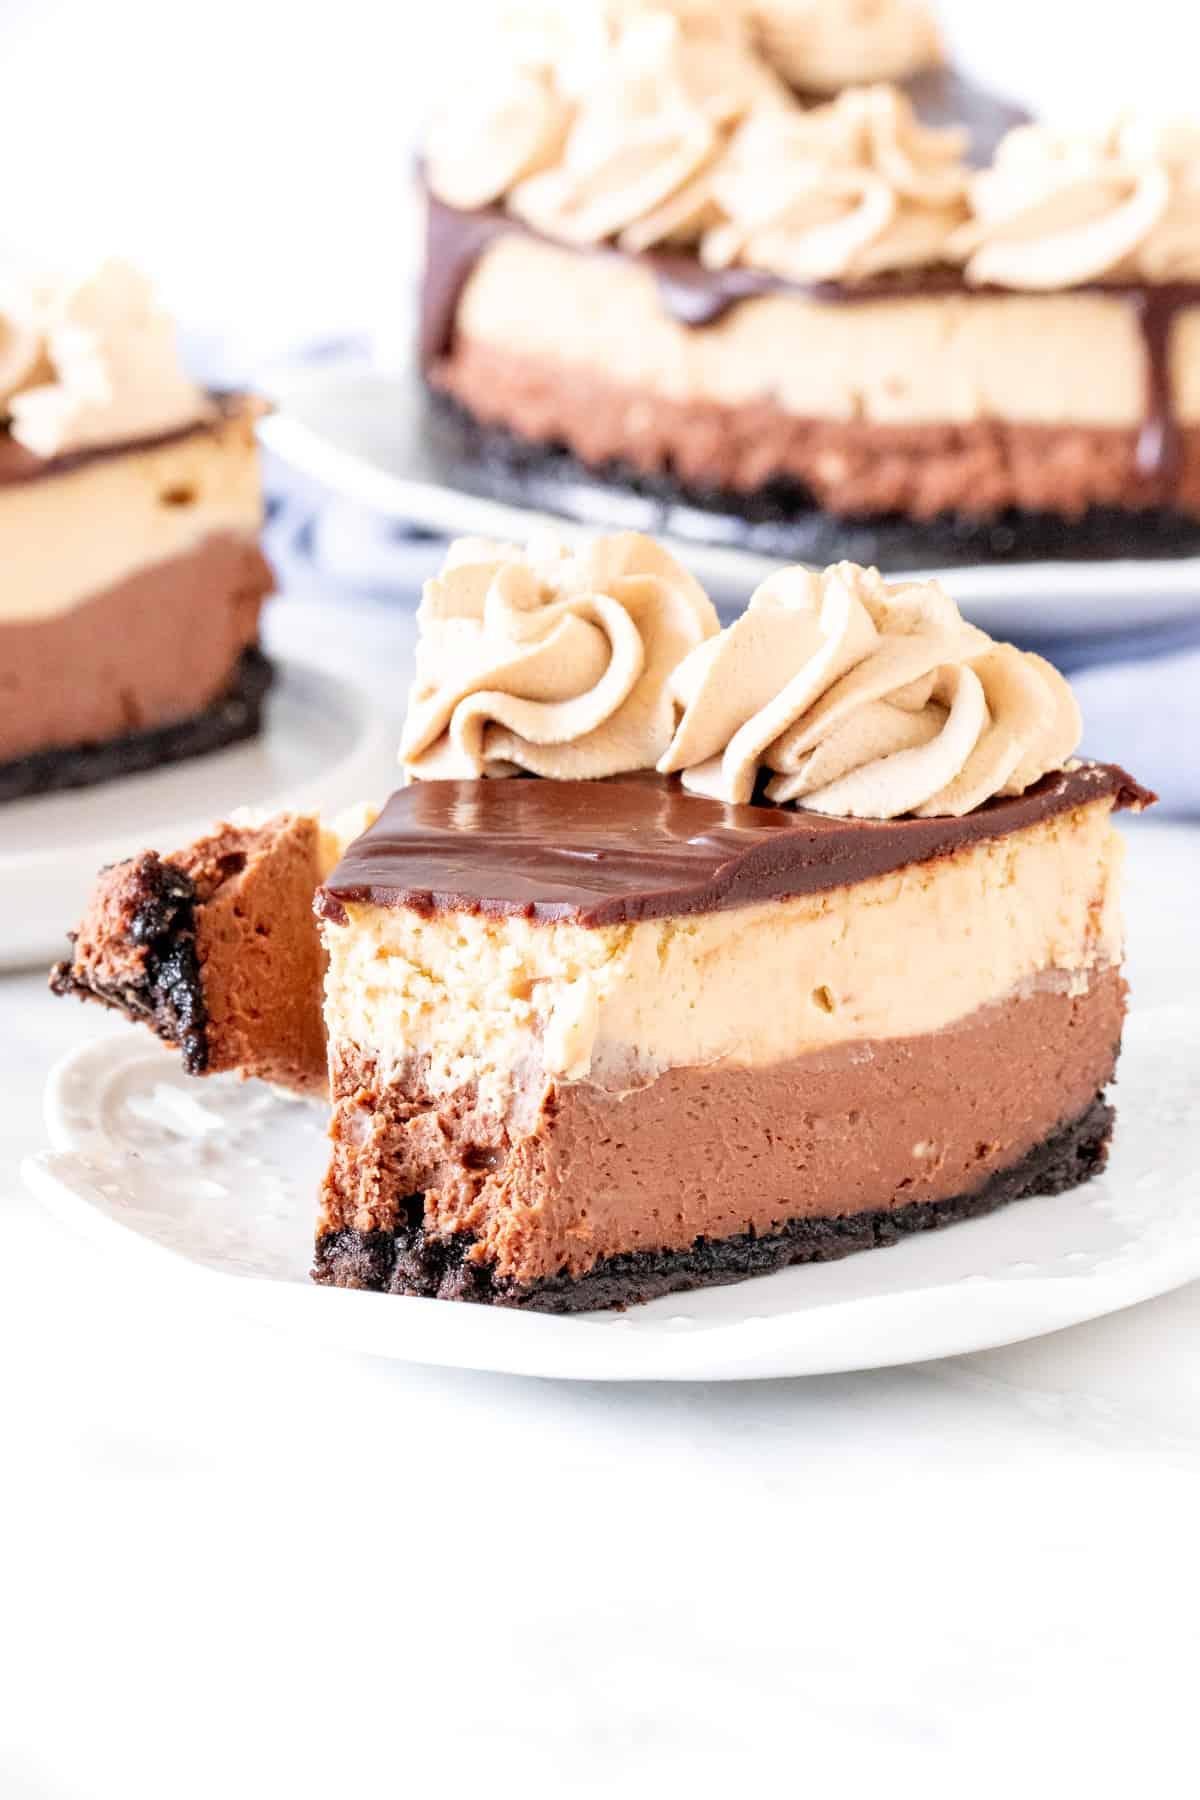 Slice of coffee and chocolate cheesecake